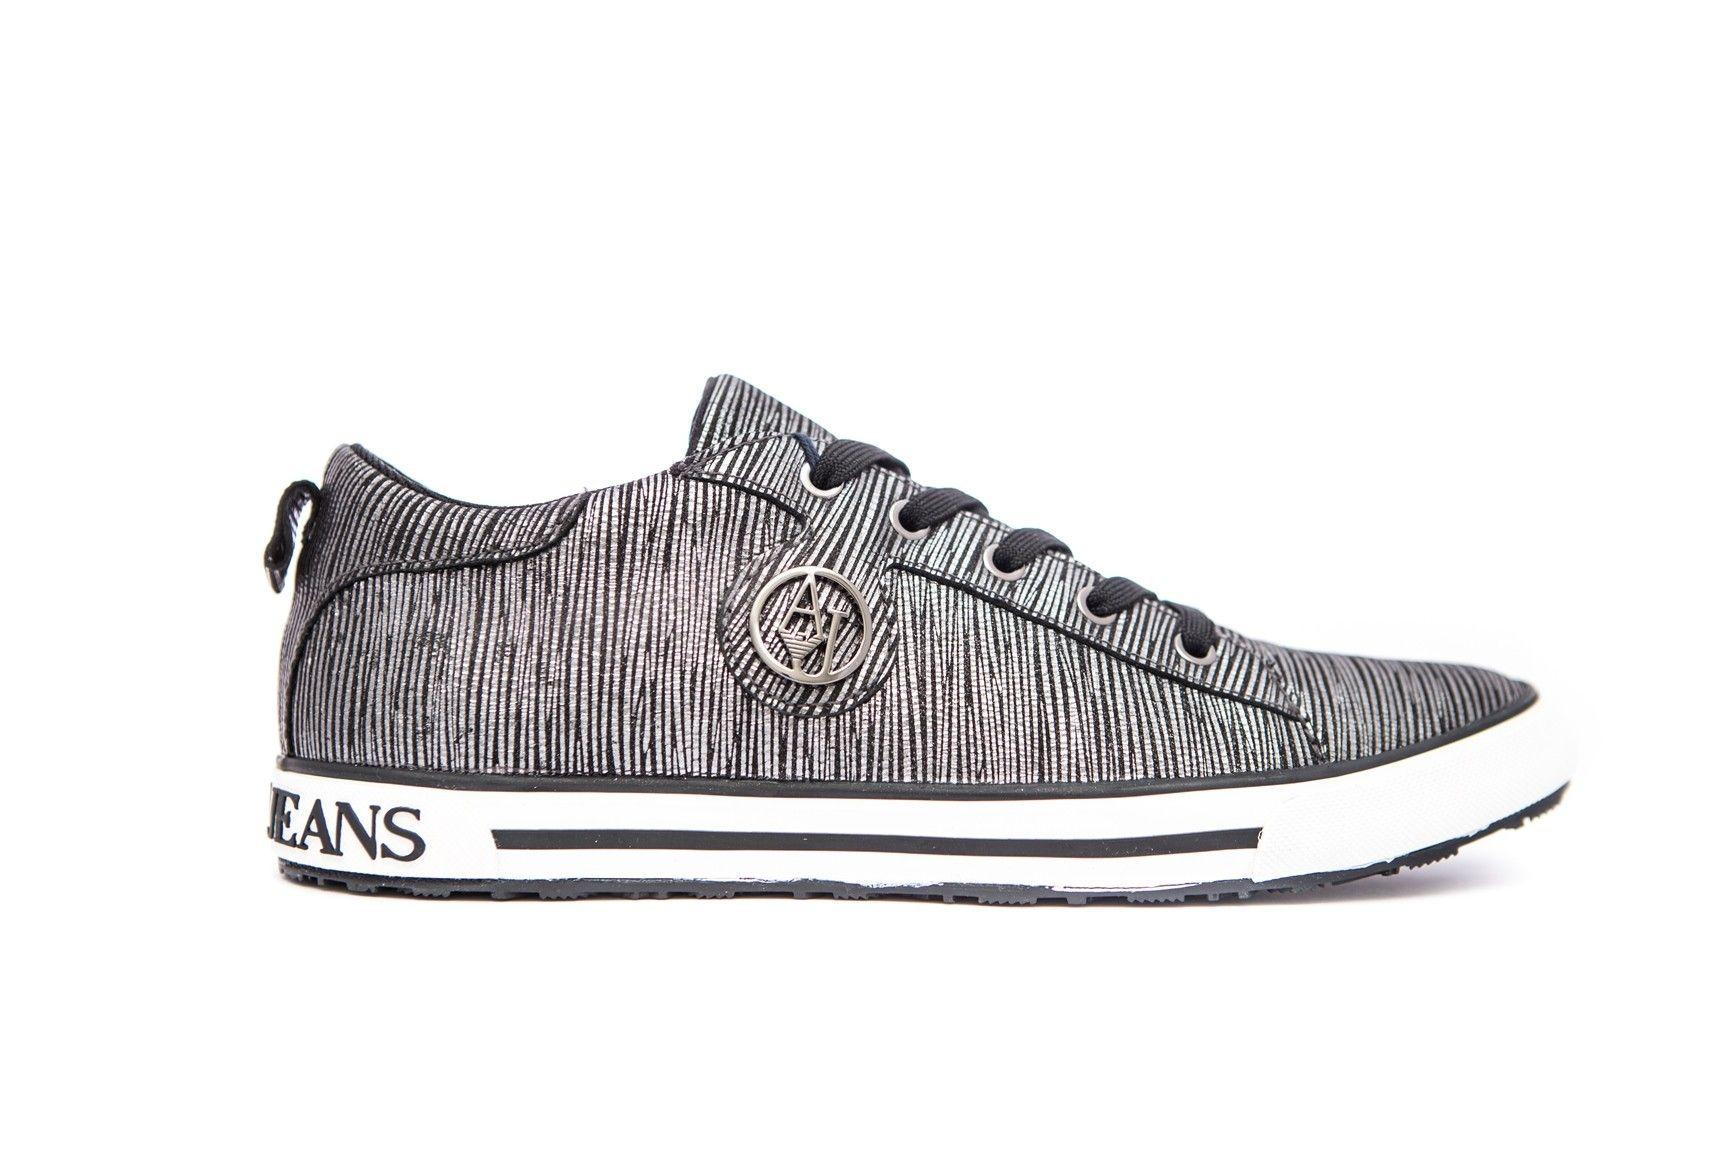 a2309dd568d08 Armani Jeans Buty D. Sneaker Antracite 40 - 6956424901 - oficjalne ...